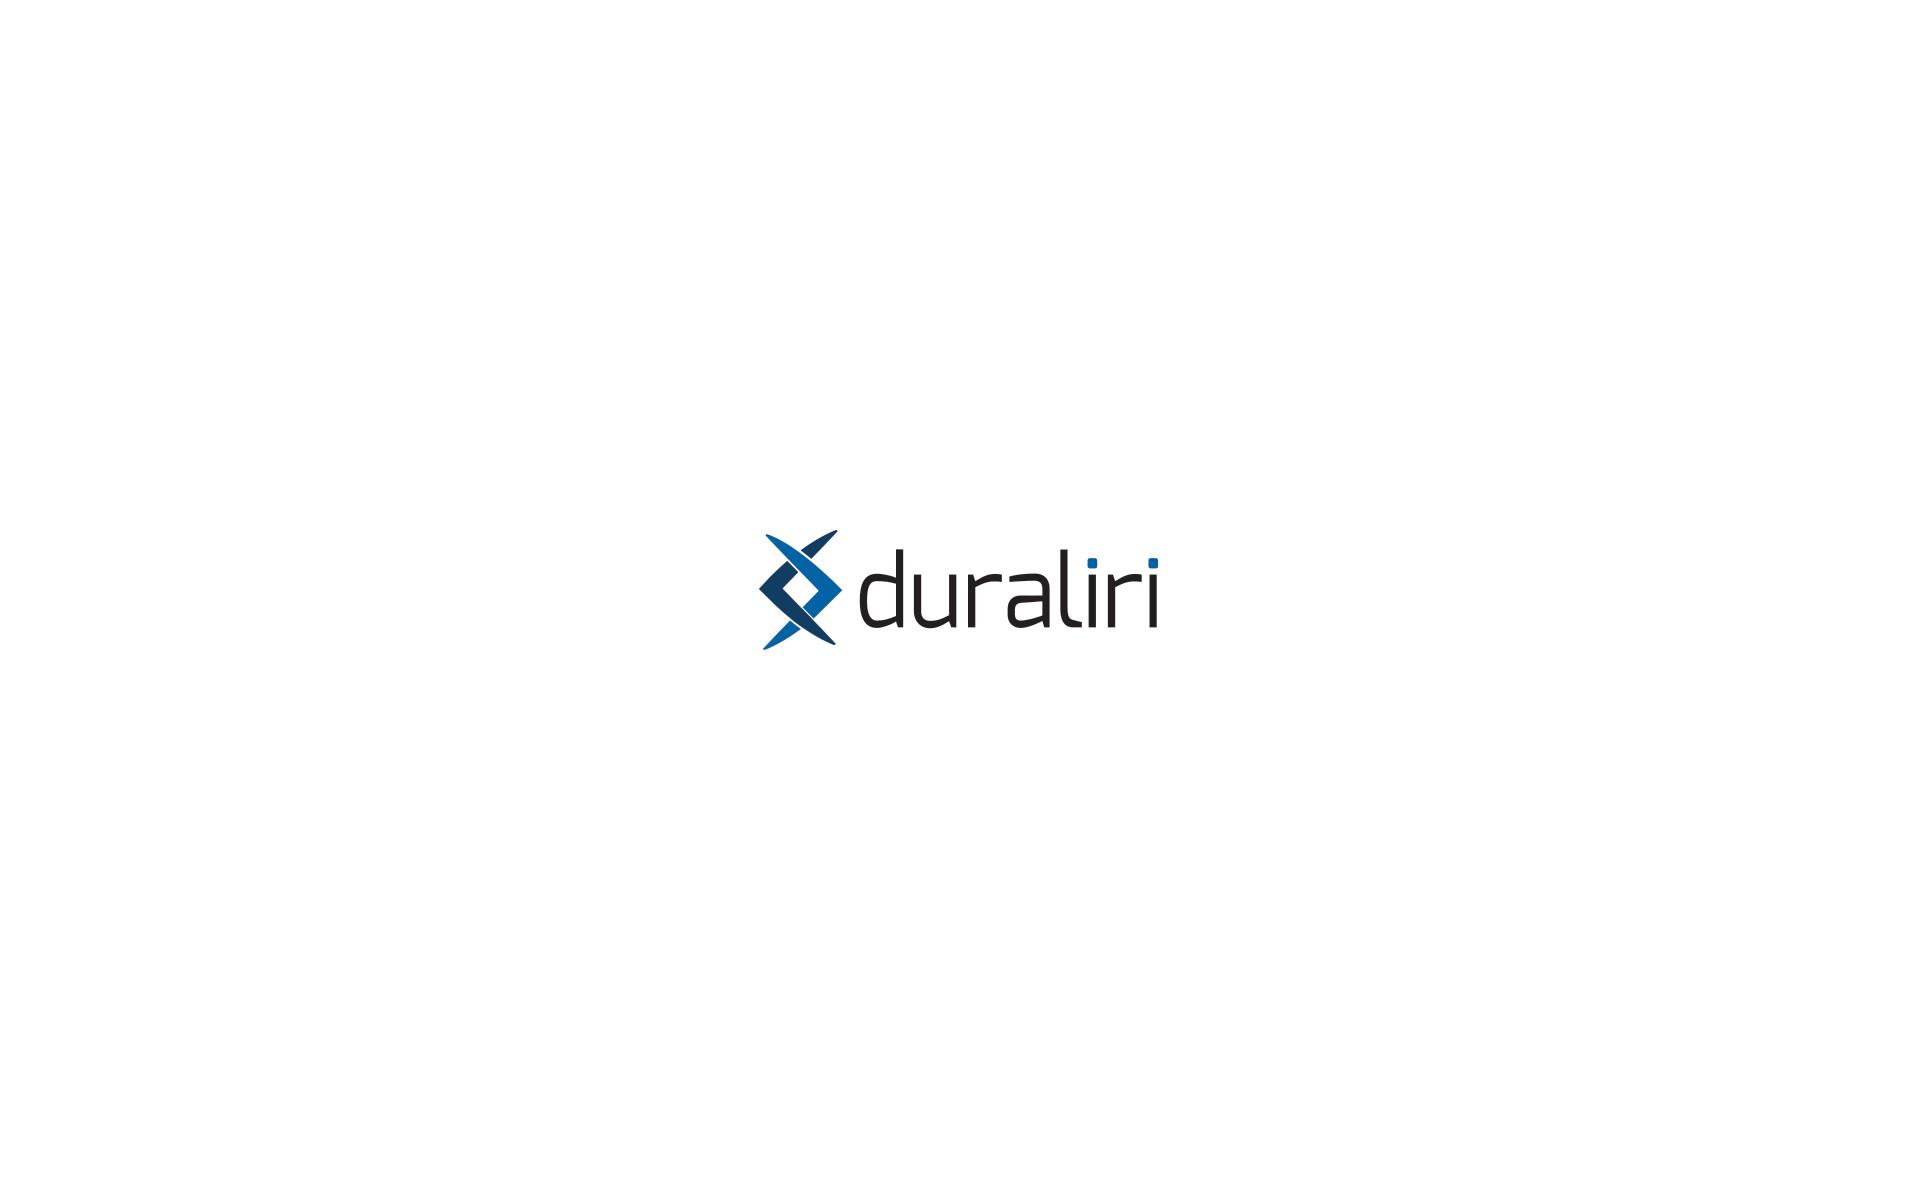 Log Duraliri